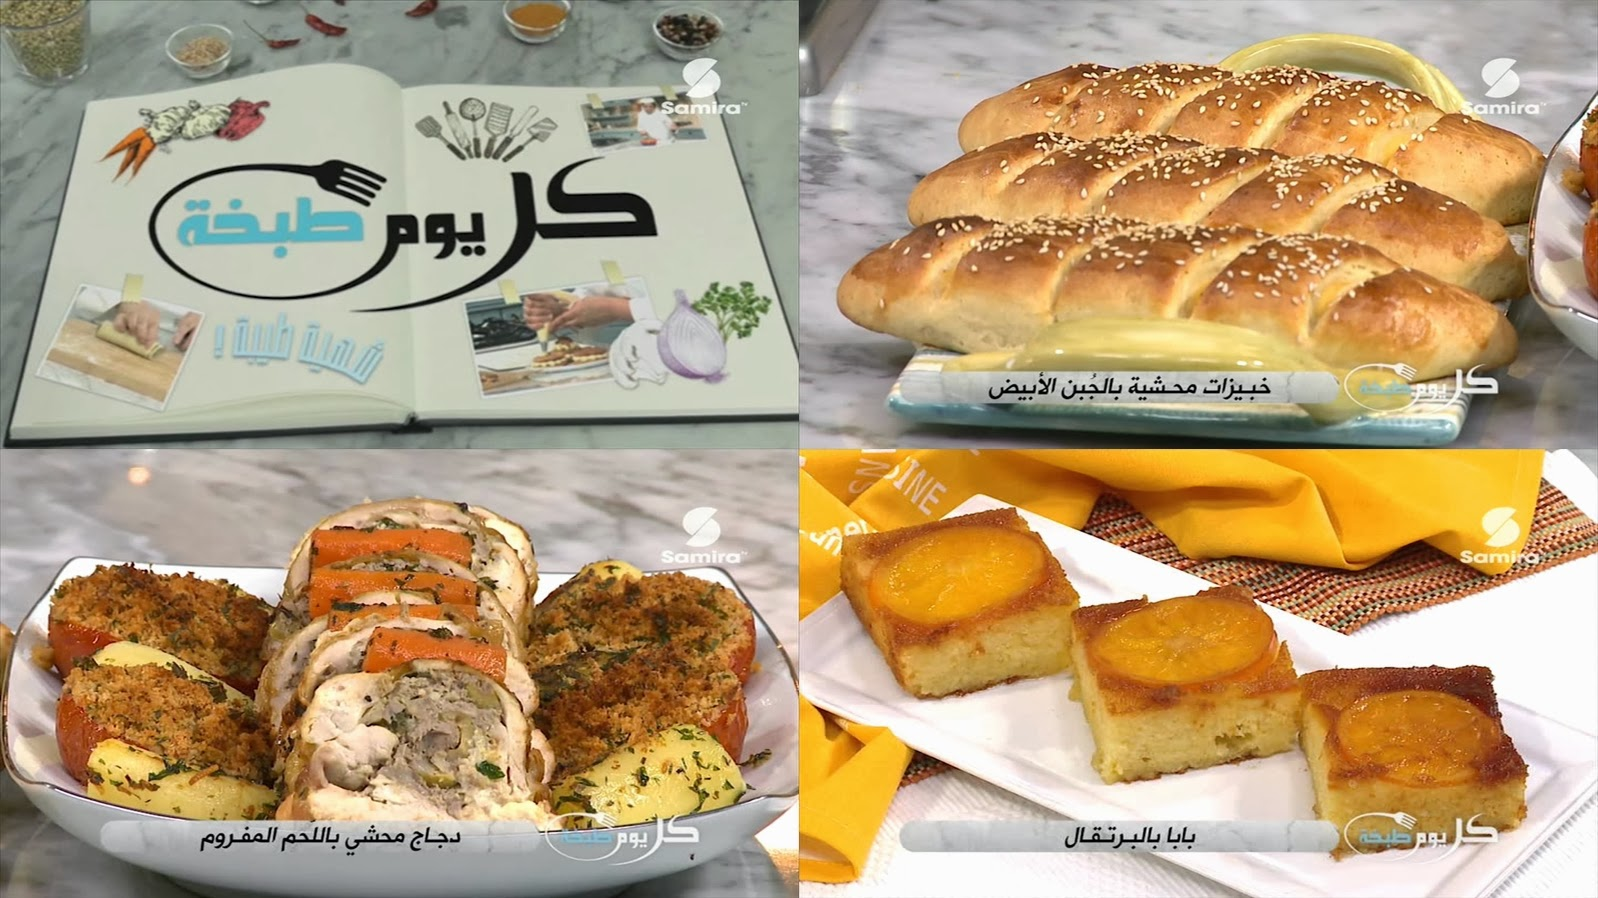 La cuisine alg rienne samira tv - Samira tv cuisine fares djidi ...